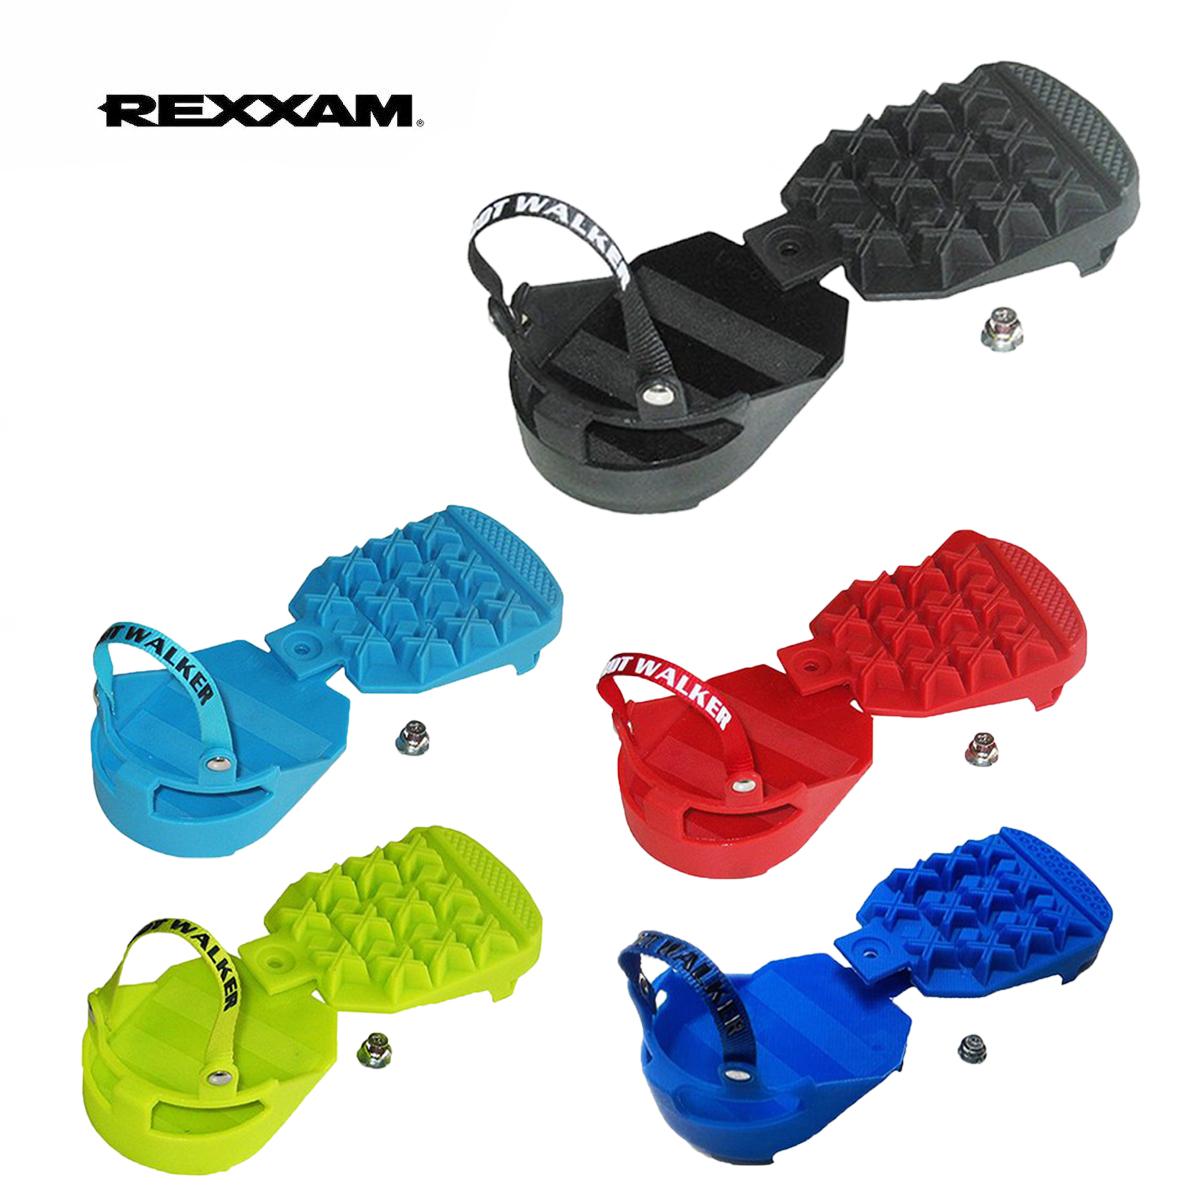 ★REXXAM〔レクザム〕ブーツソールプロテクター FOOT WALKER〔フットウォーカー〕【isyo】【SOLPR】【SPL】